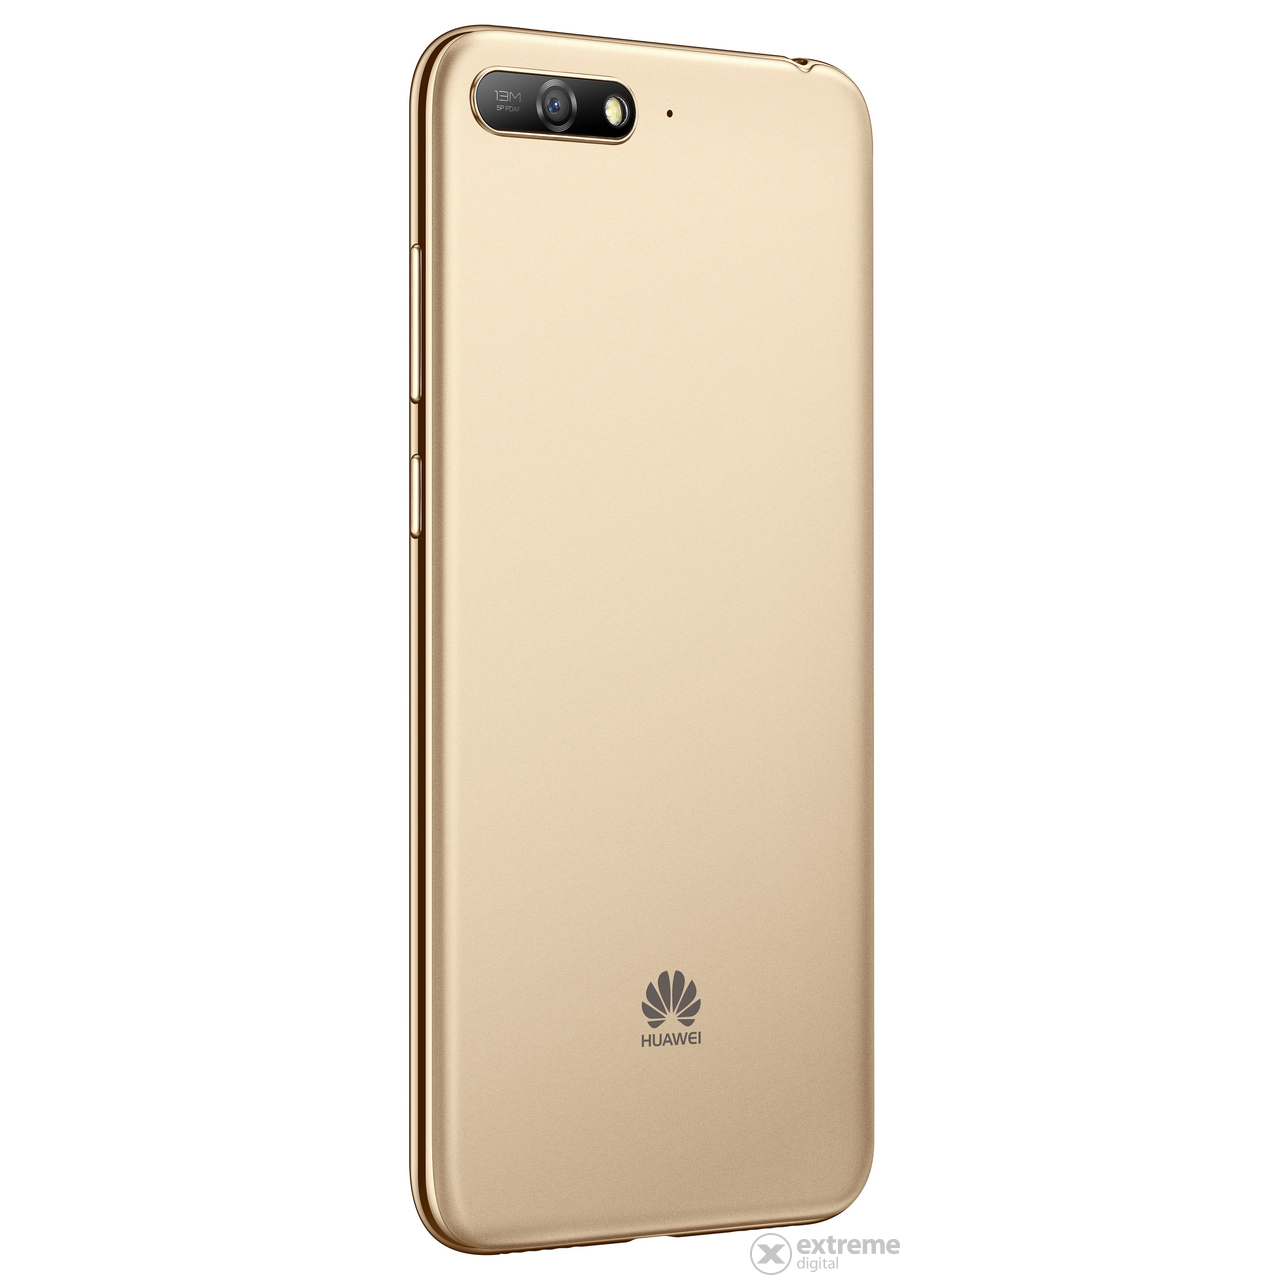 Telefon Huawei Y6 (2018) Dual SIM, Gold (Android ...